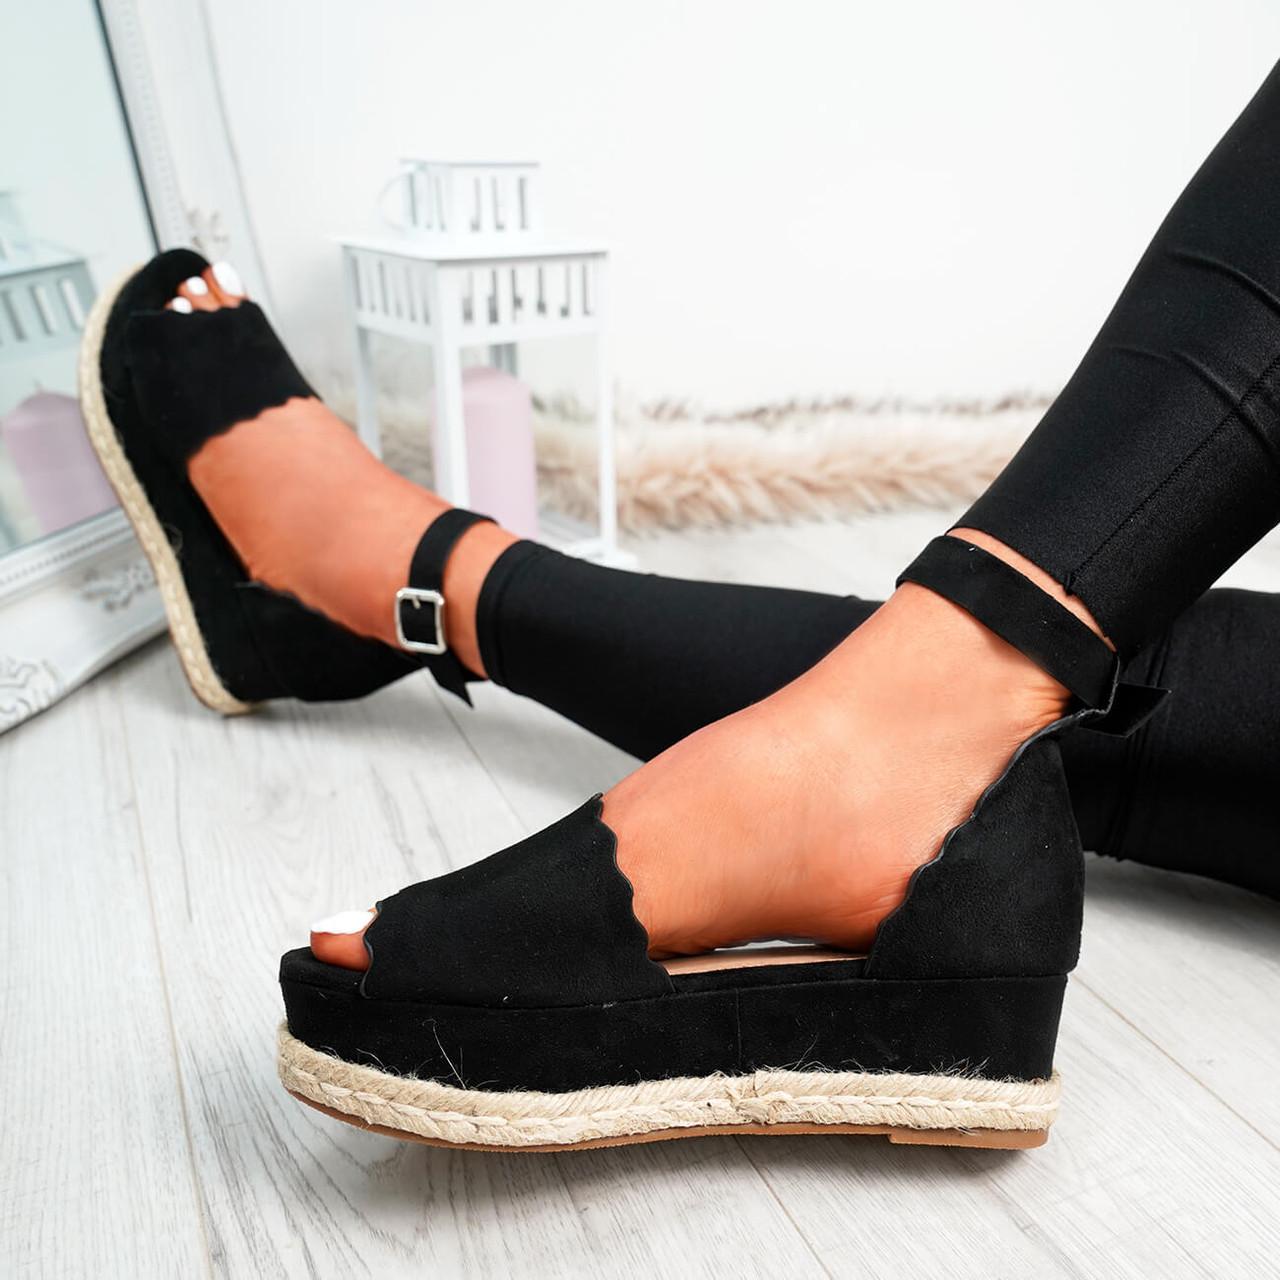 Womens High Wedge Heel Platform Sandals Ladies Espadrille Ankle Strap Shoes Size